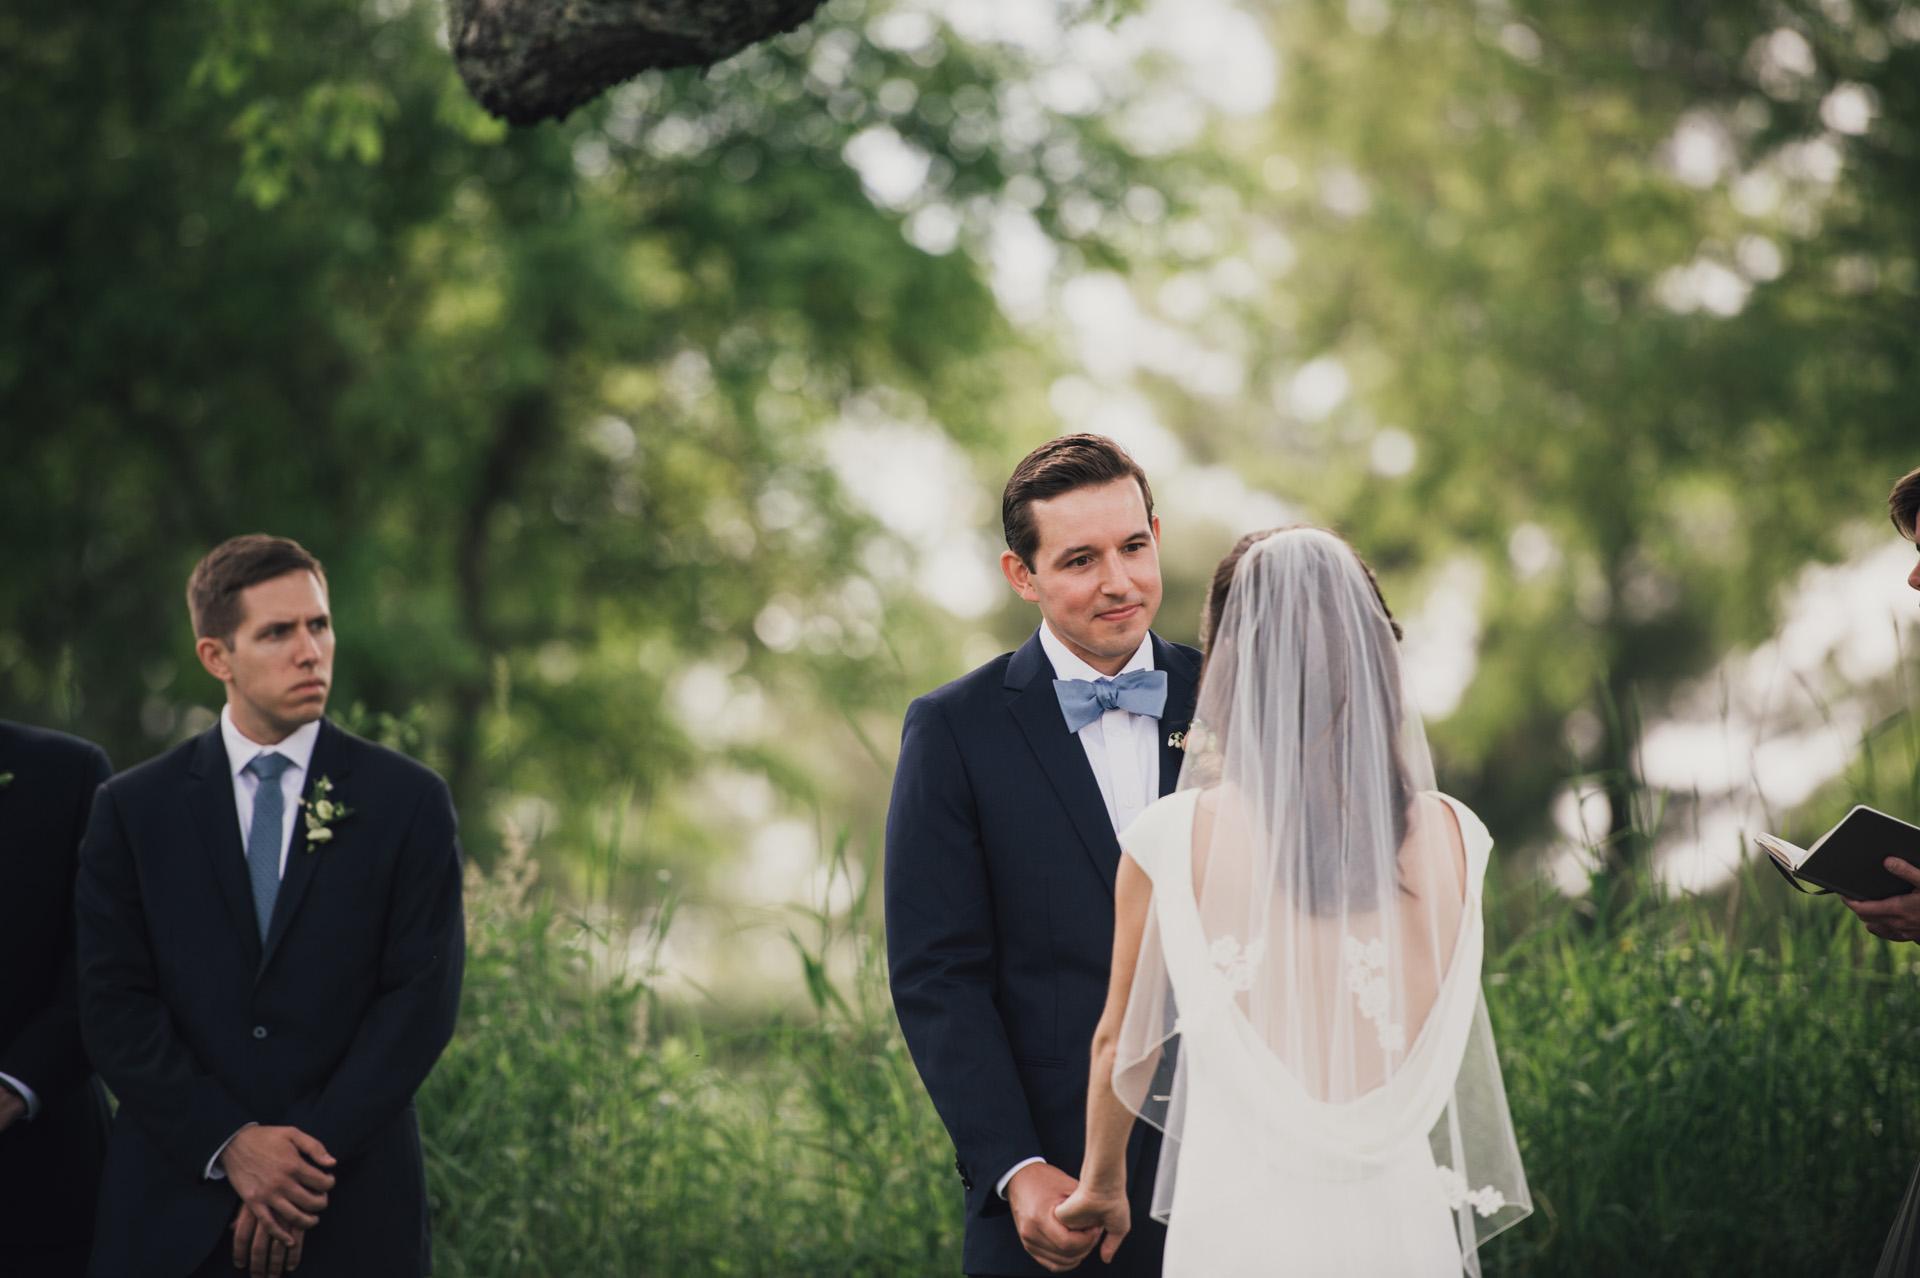 gedney-farm-wedding-photographer-35